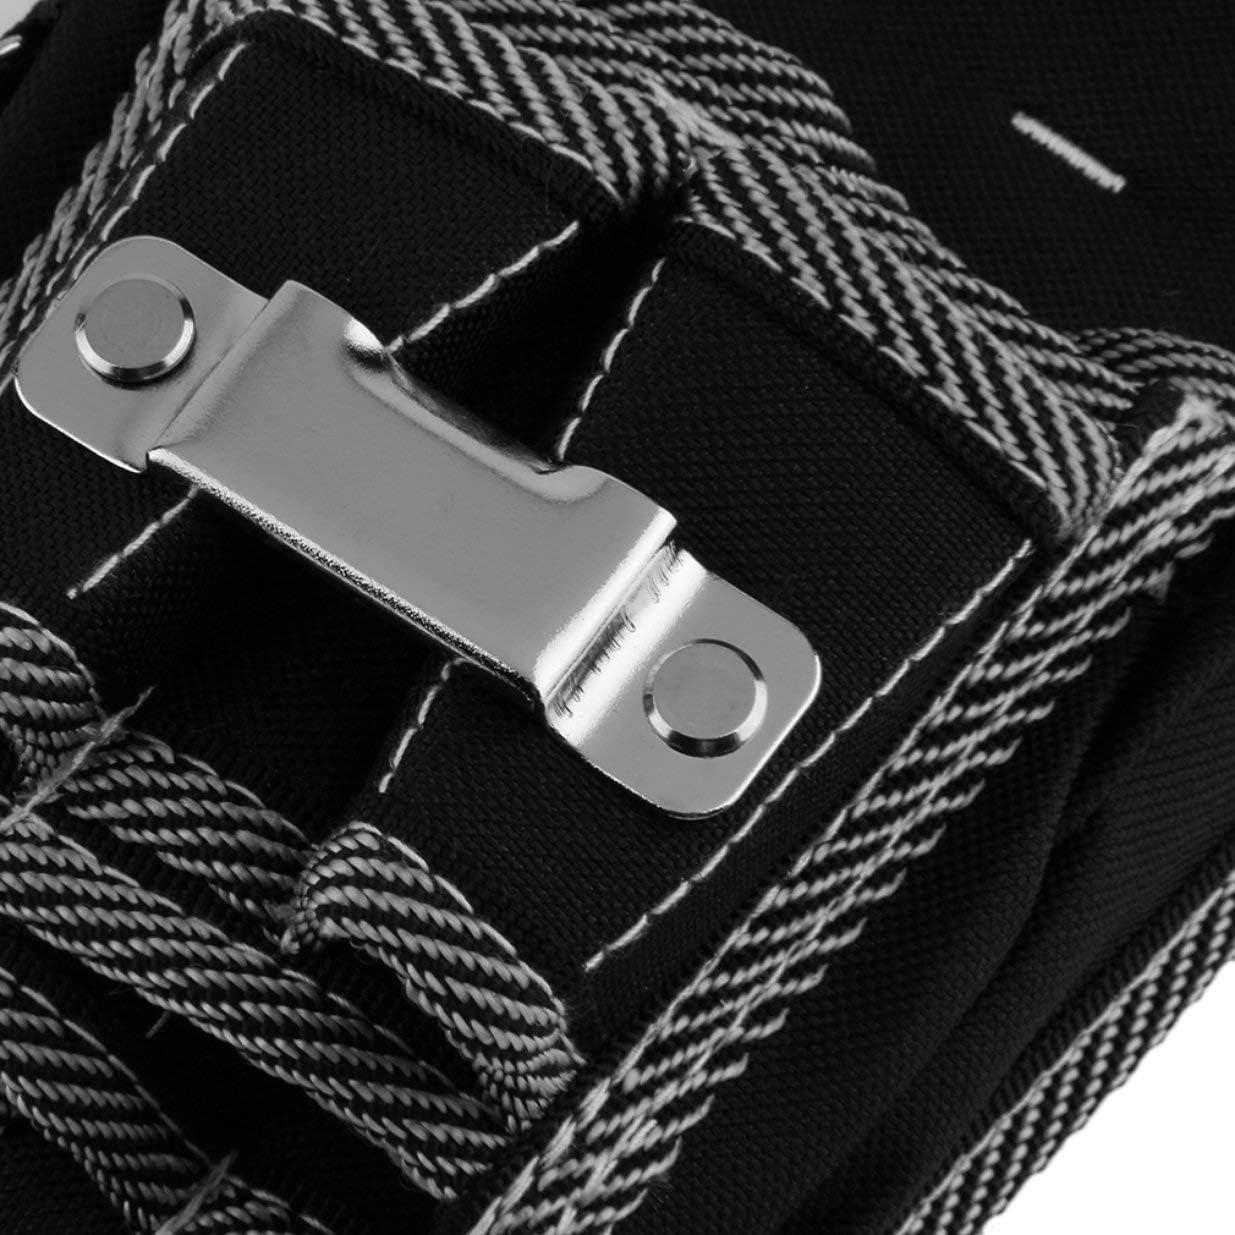 Sairis Multifuncional 9 en 1 Electricista Cintura Bolsillo Herramienta de Bolsillo Cintur/ón Bolsa Bolsa Destornillador Soporte de Utilidad Bolsillos de Cintura Bolsas